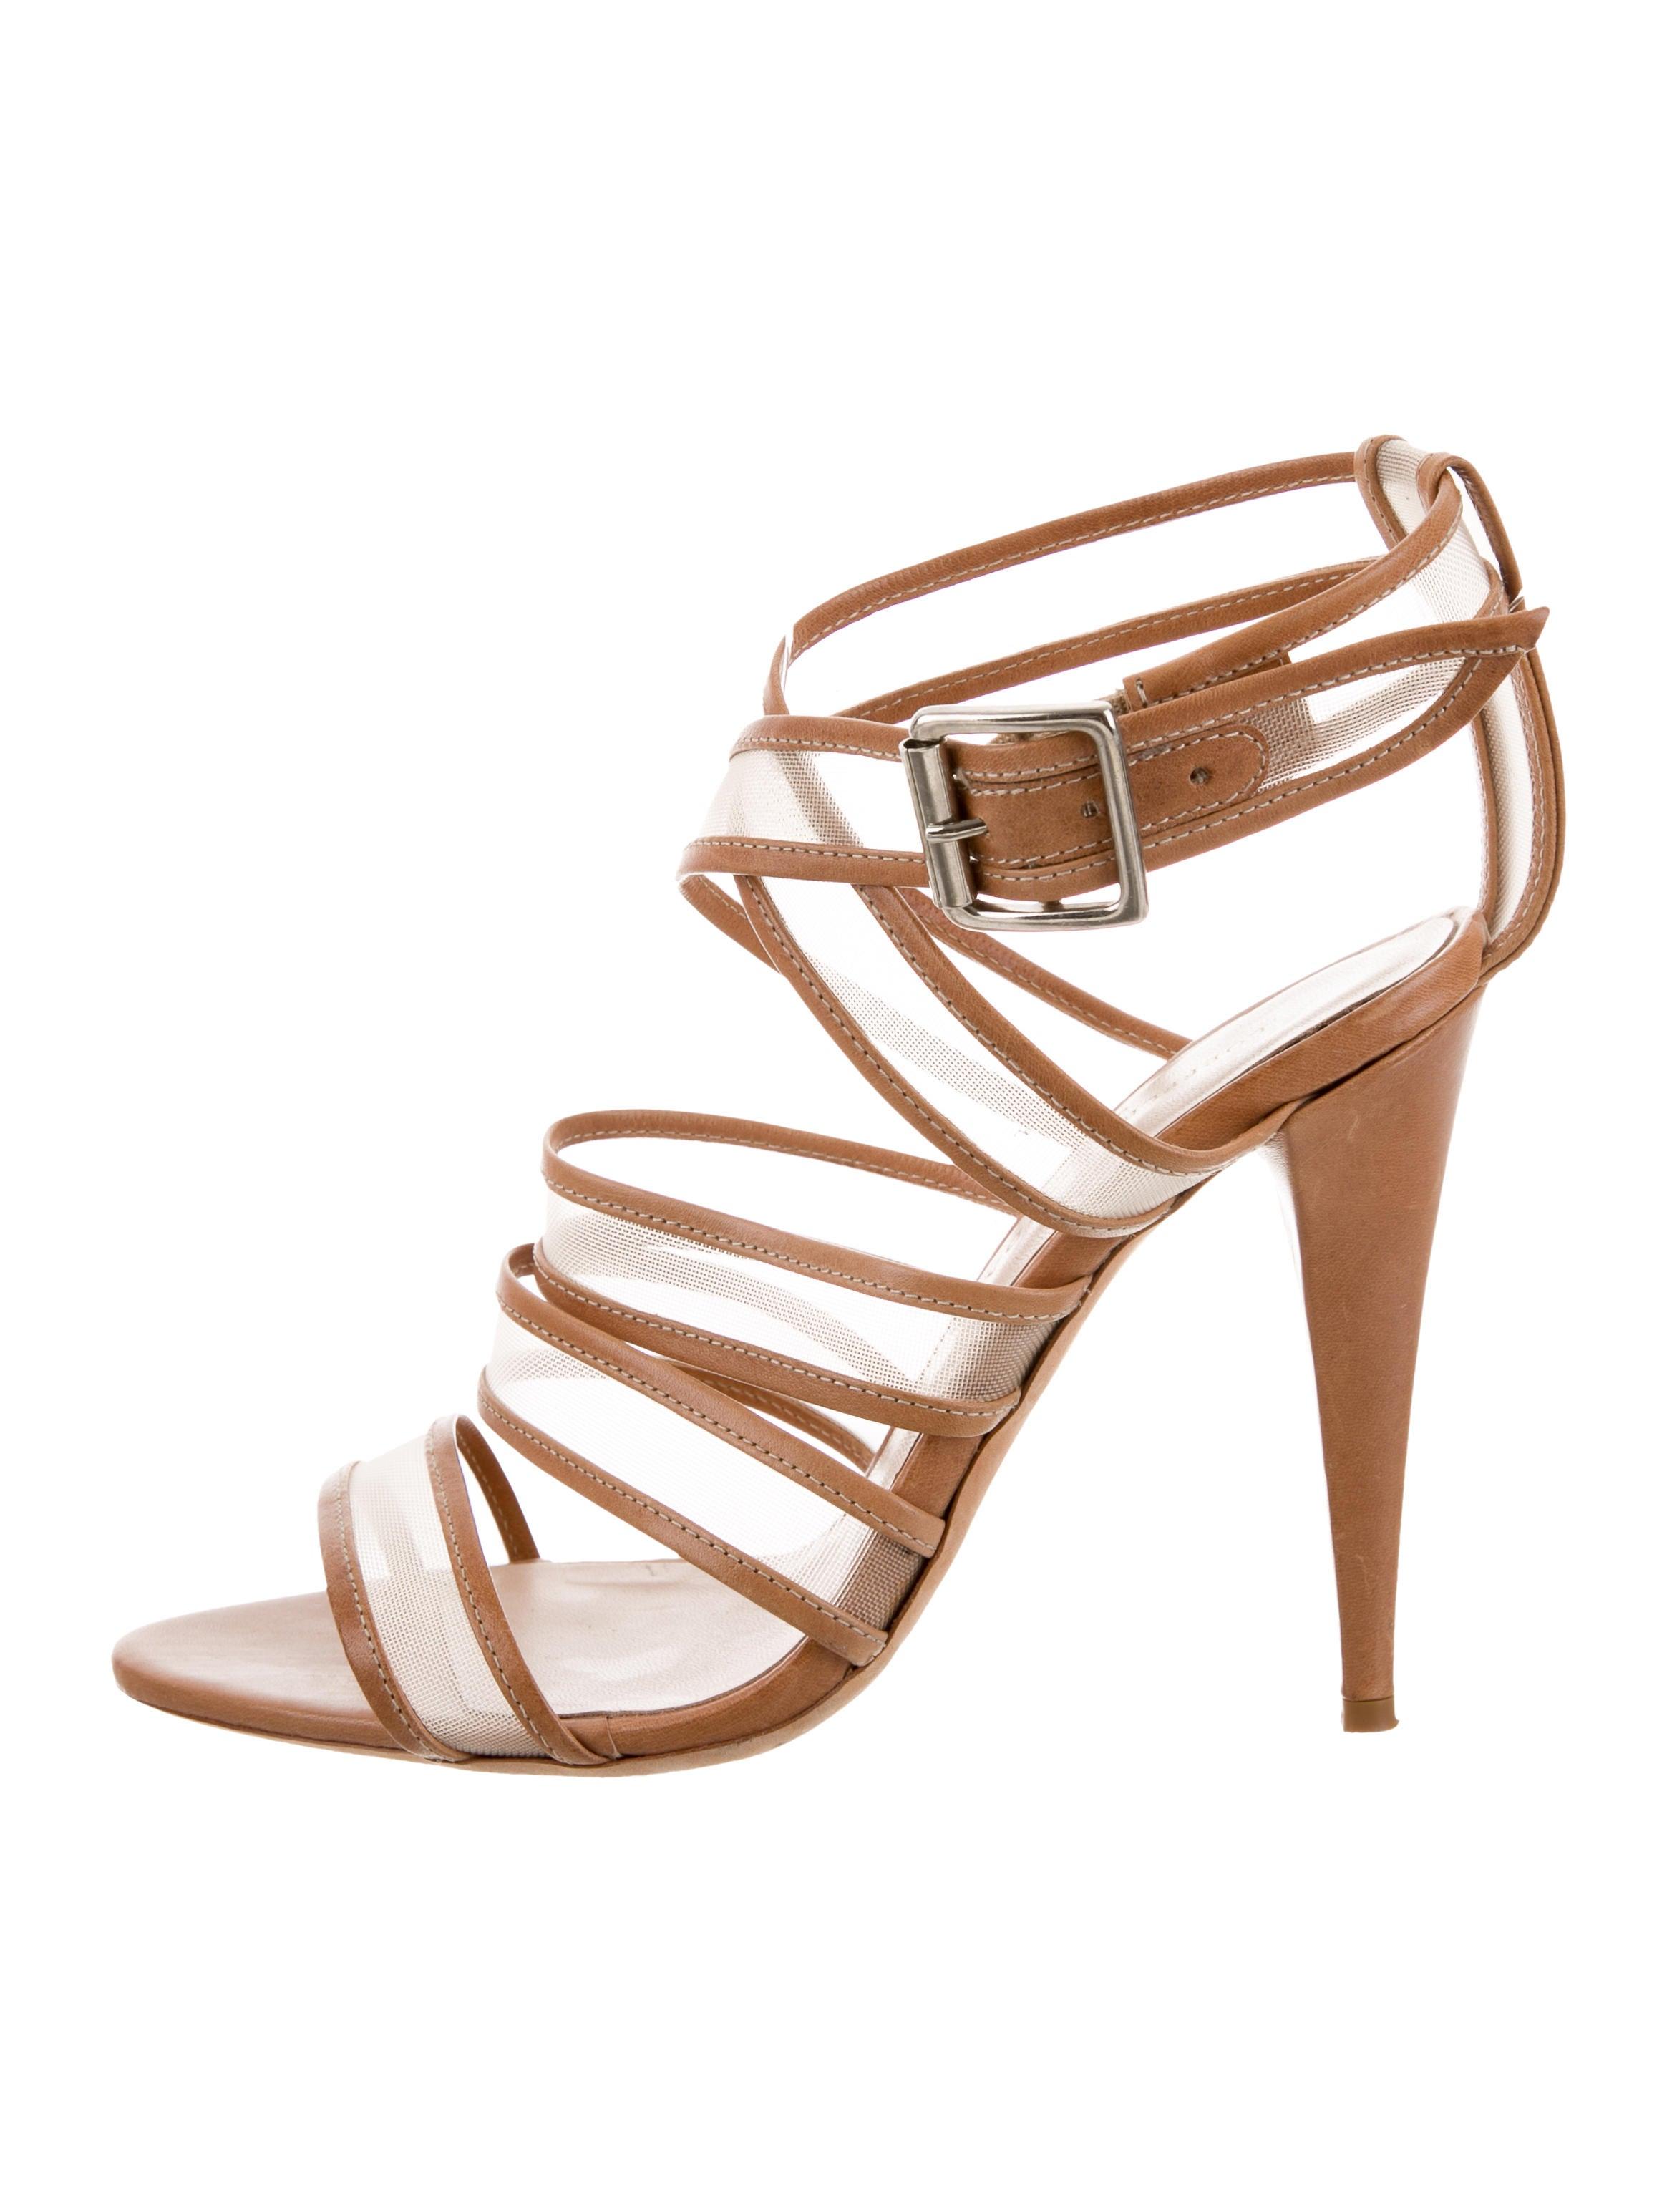 cheap sale 100% guaranteed Loeffler Randall Leather & Mesh Sandals cheap nicekicks Vd4uNUYjVP